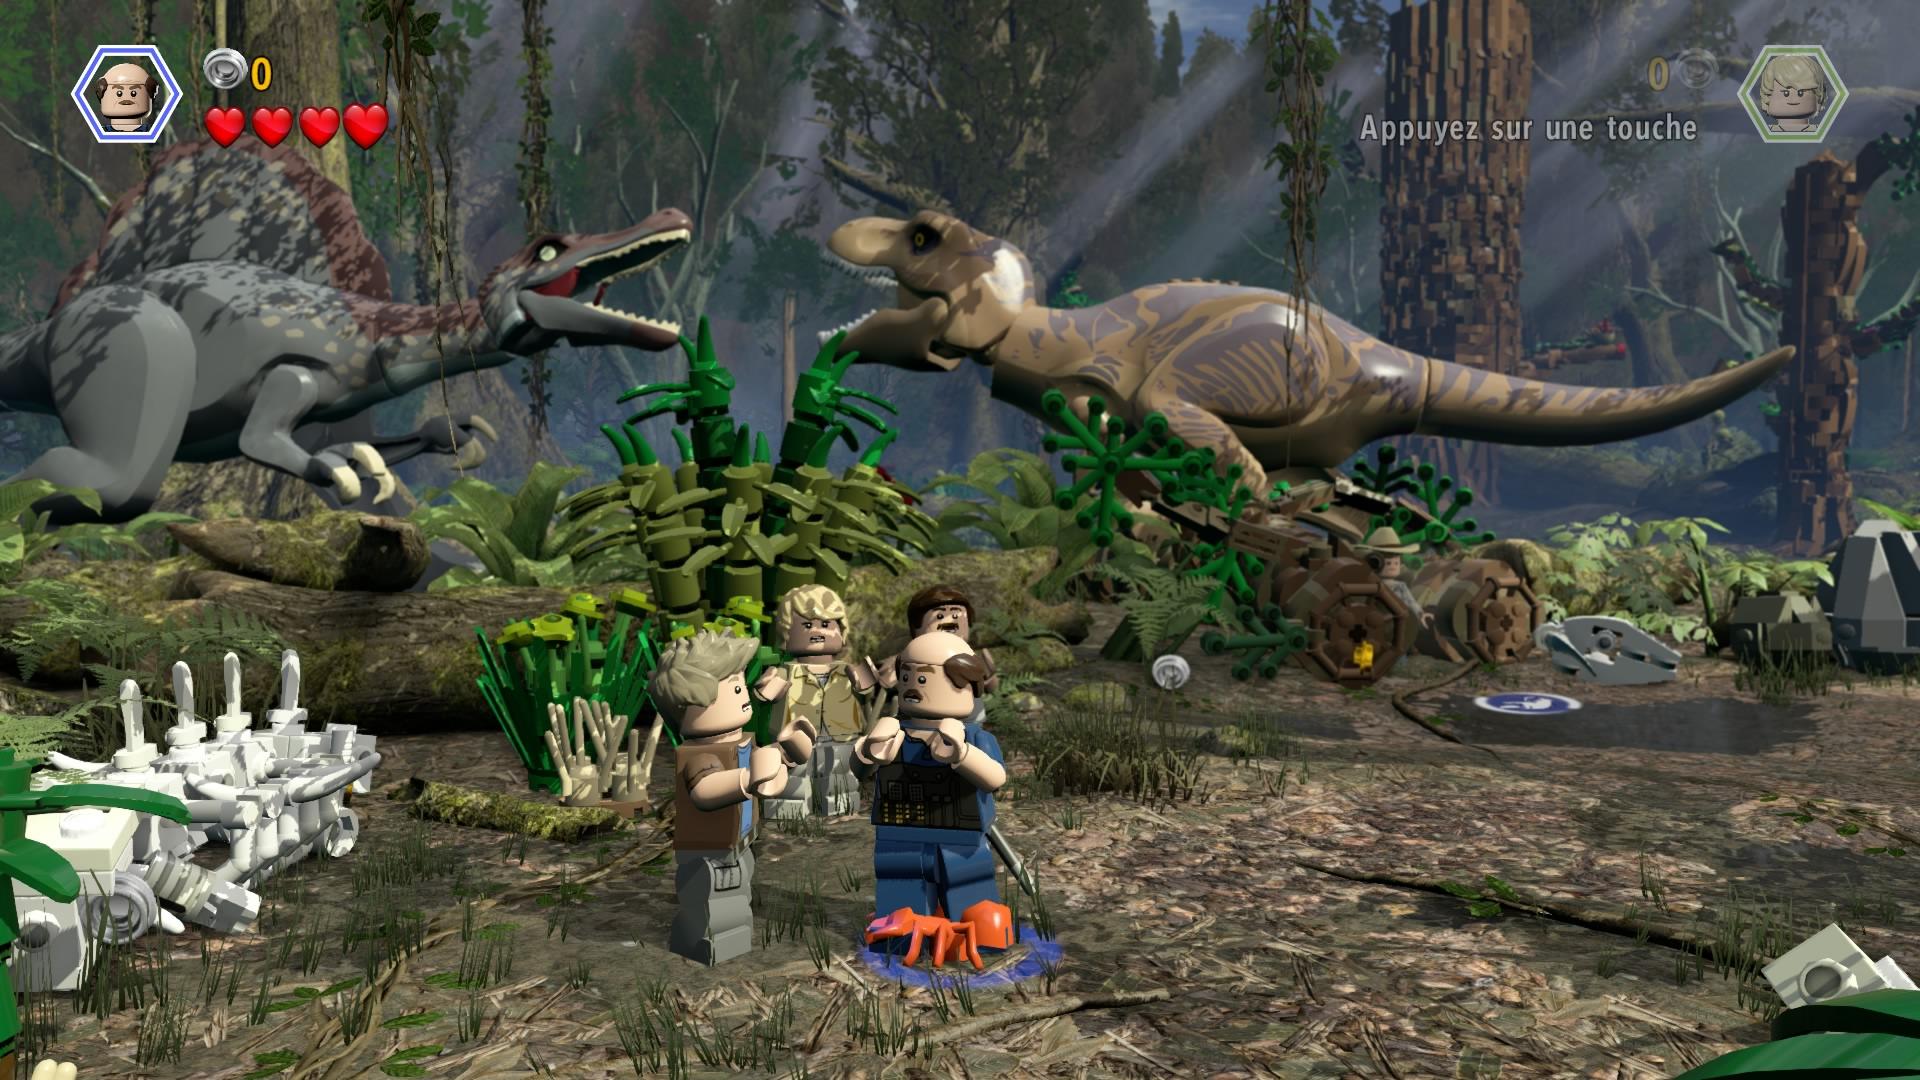 Test de lego jurassic world ps4 geektest - Jeux de jurassic park 3 ...